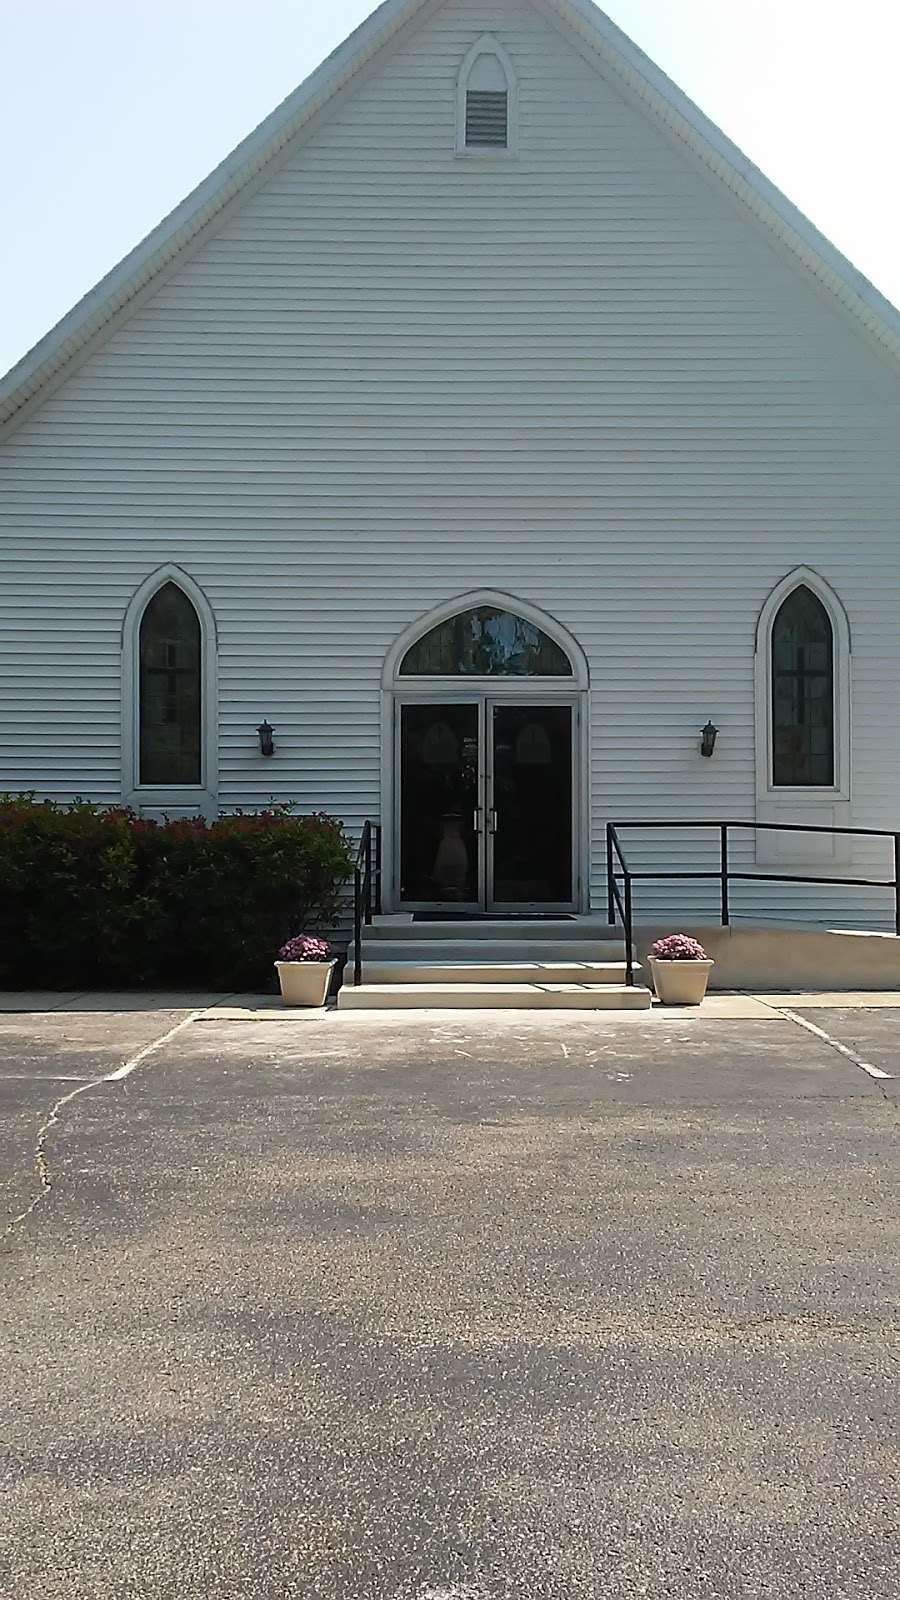 Huntsville Good Shepherd Church - church    Photo 2 of 4   Address: 3126 Market St, Pendleton, IN 46064, USA   Phone: (765) 778-2993